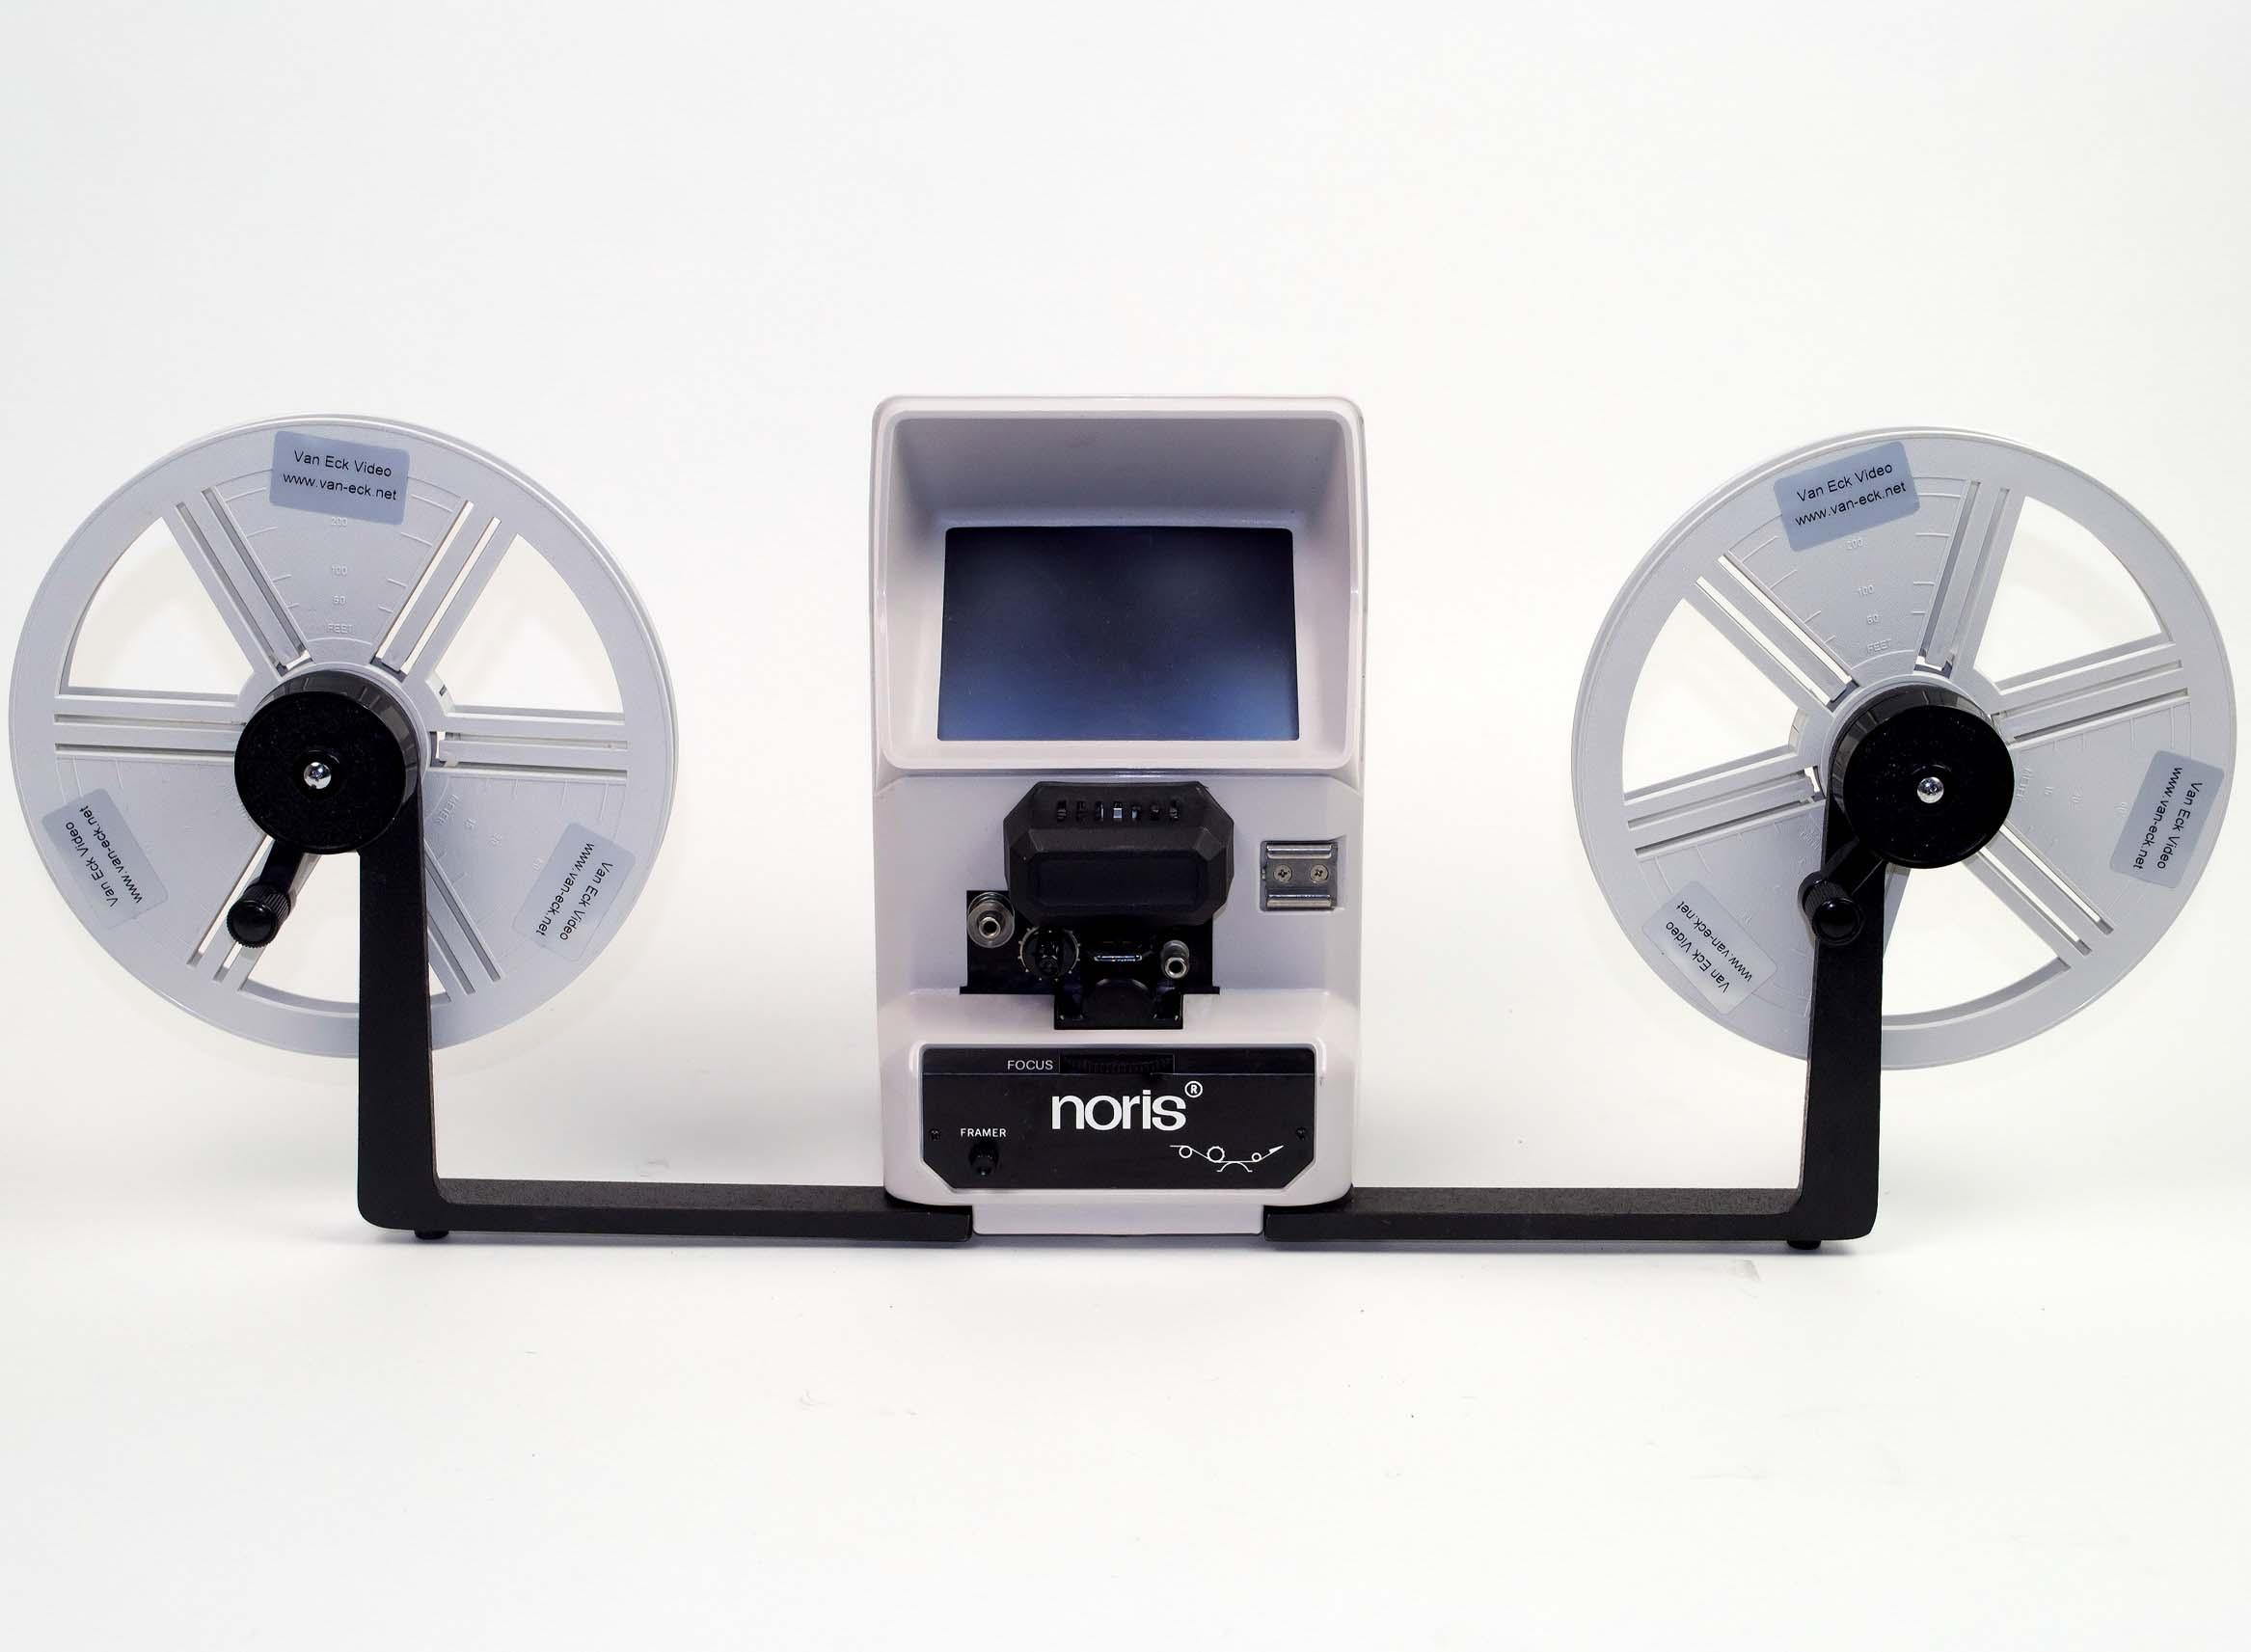 8mm editor viewer